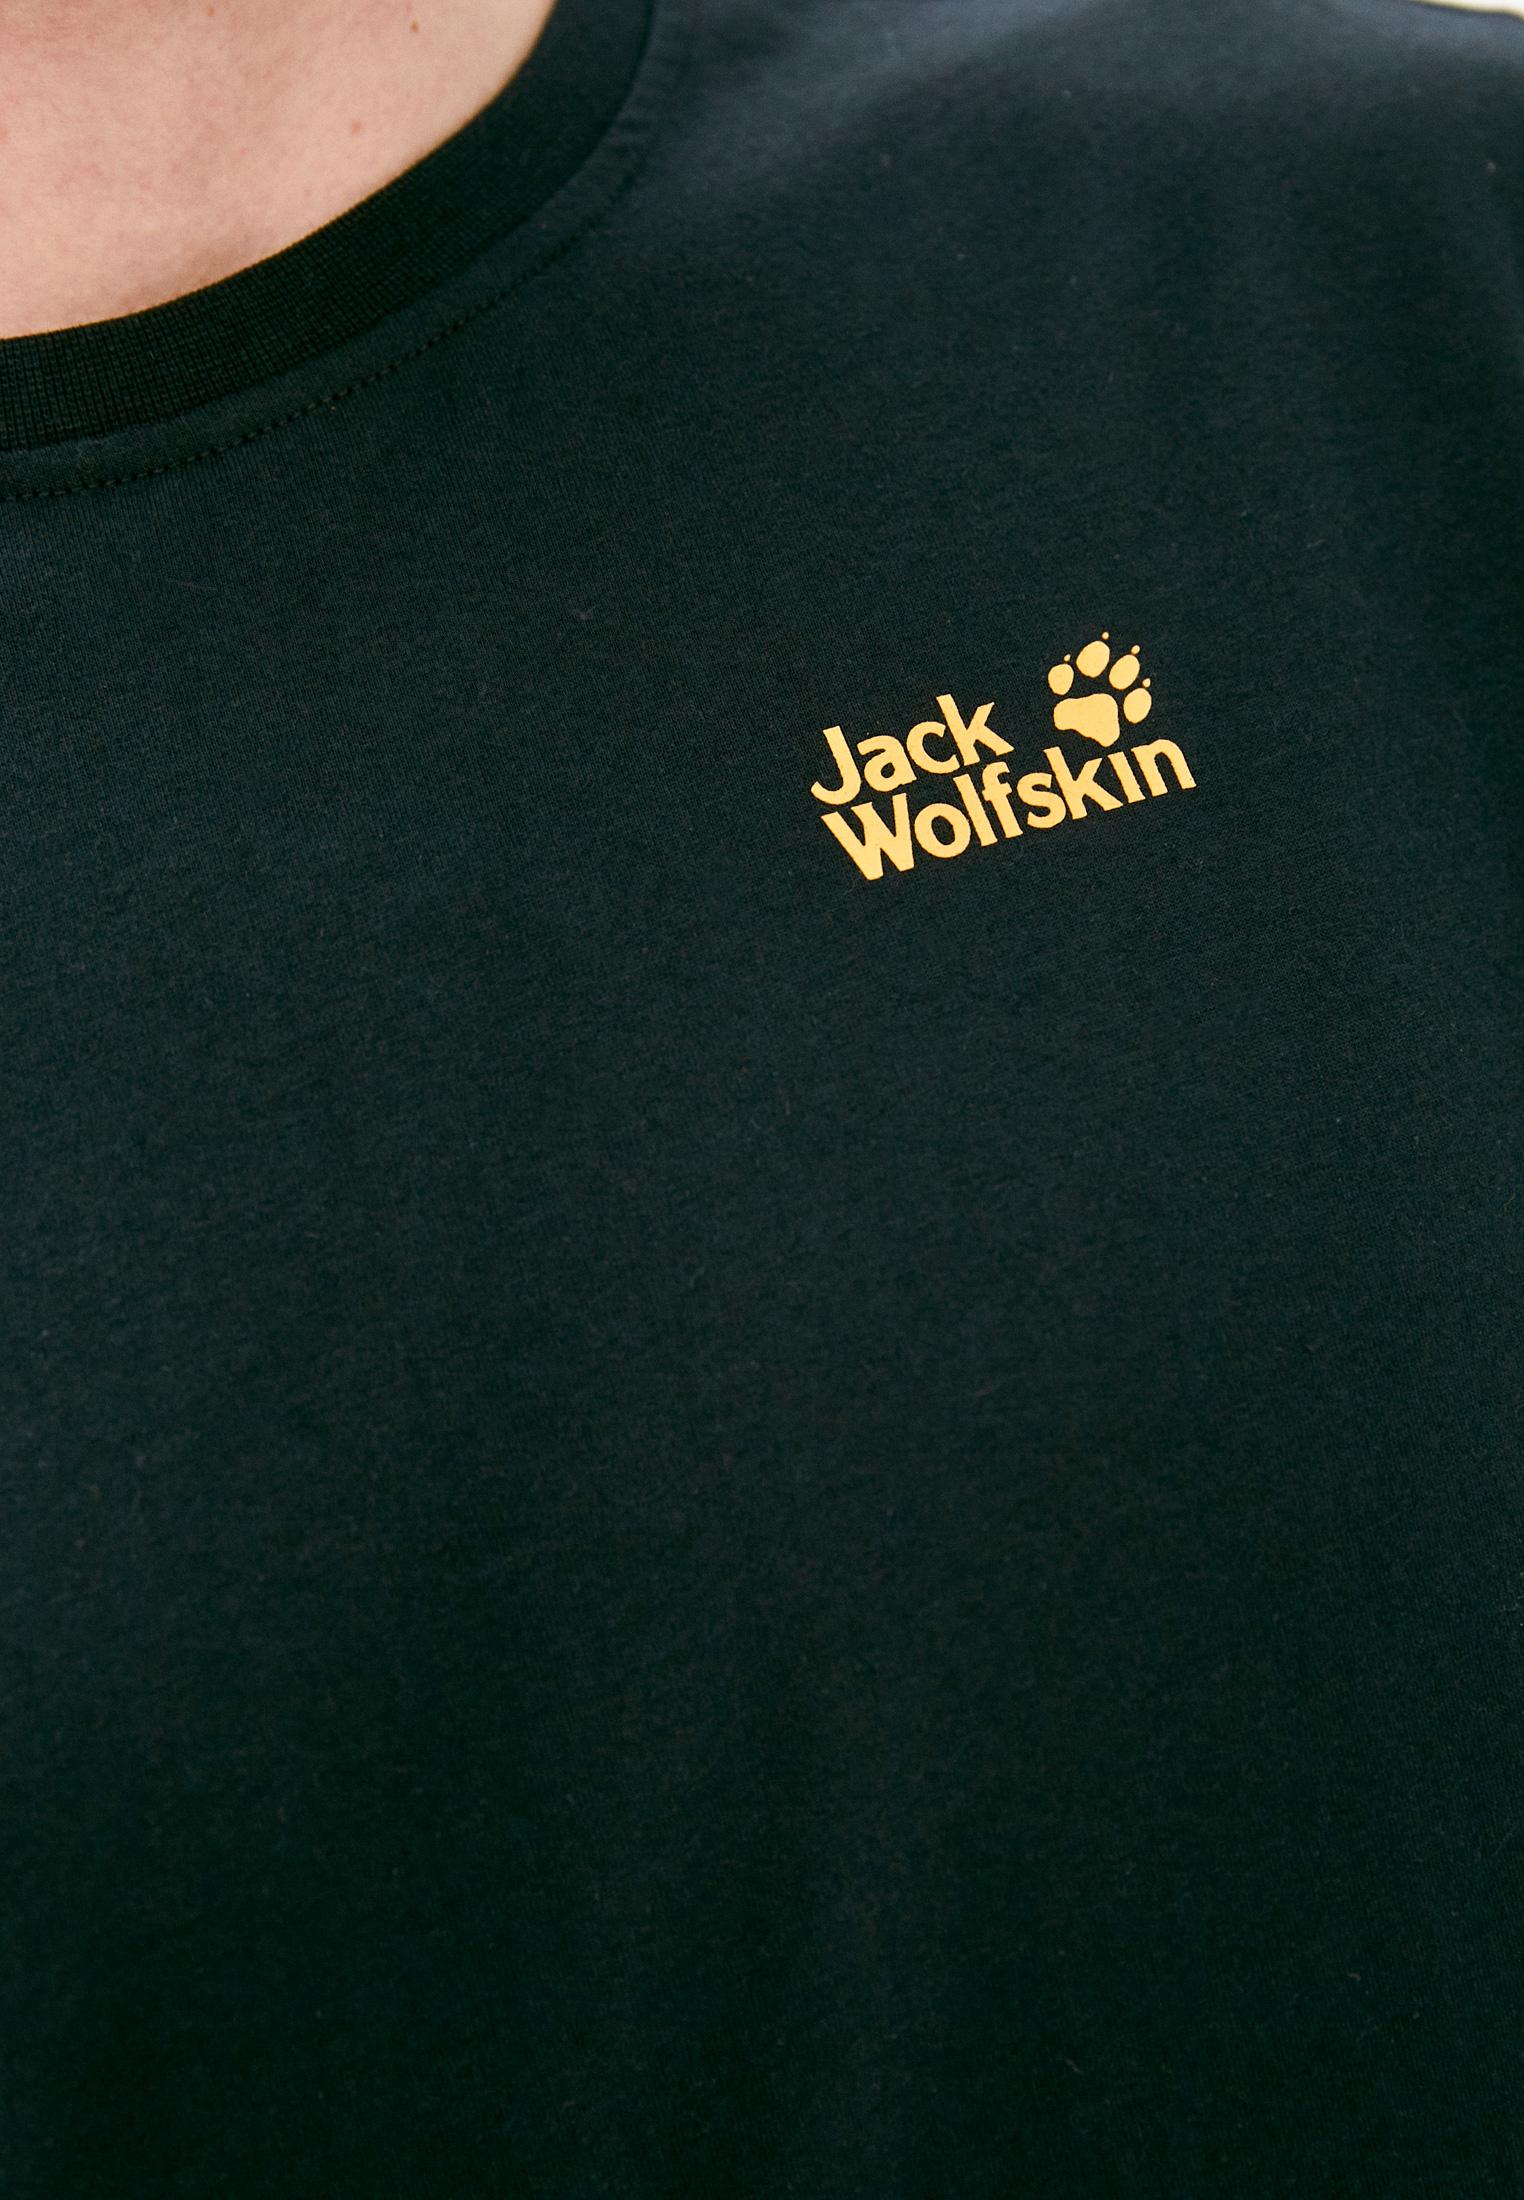 Футболка Jack Wolfskin 1805781: изображение 3